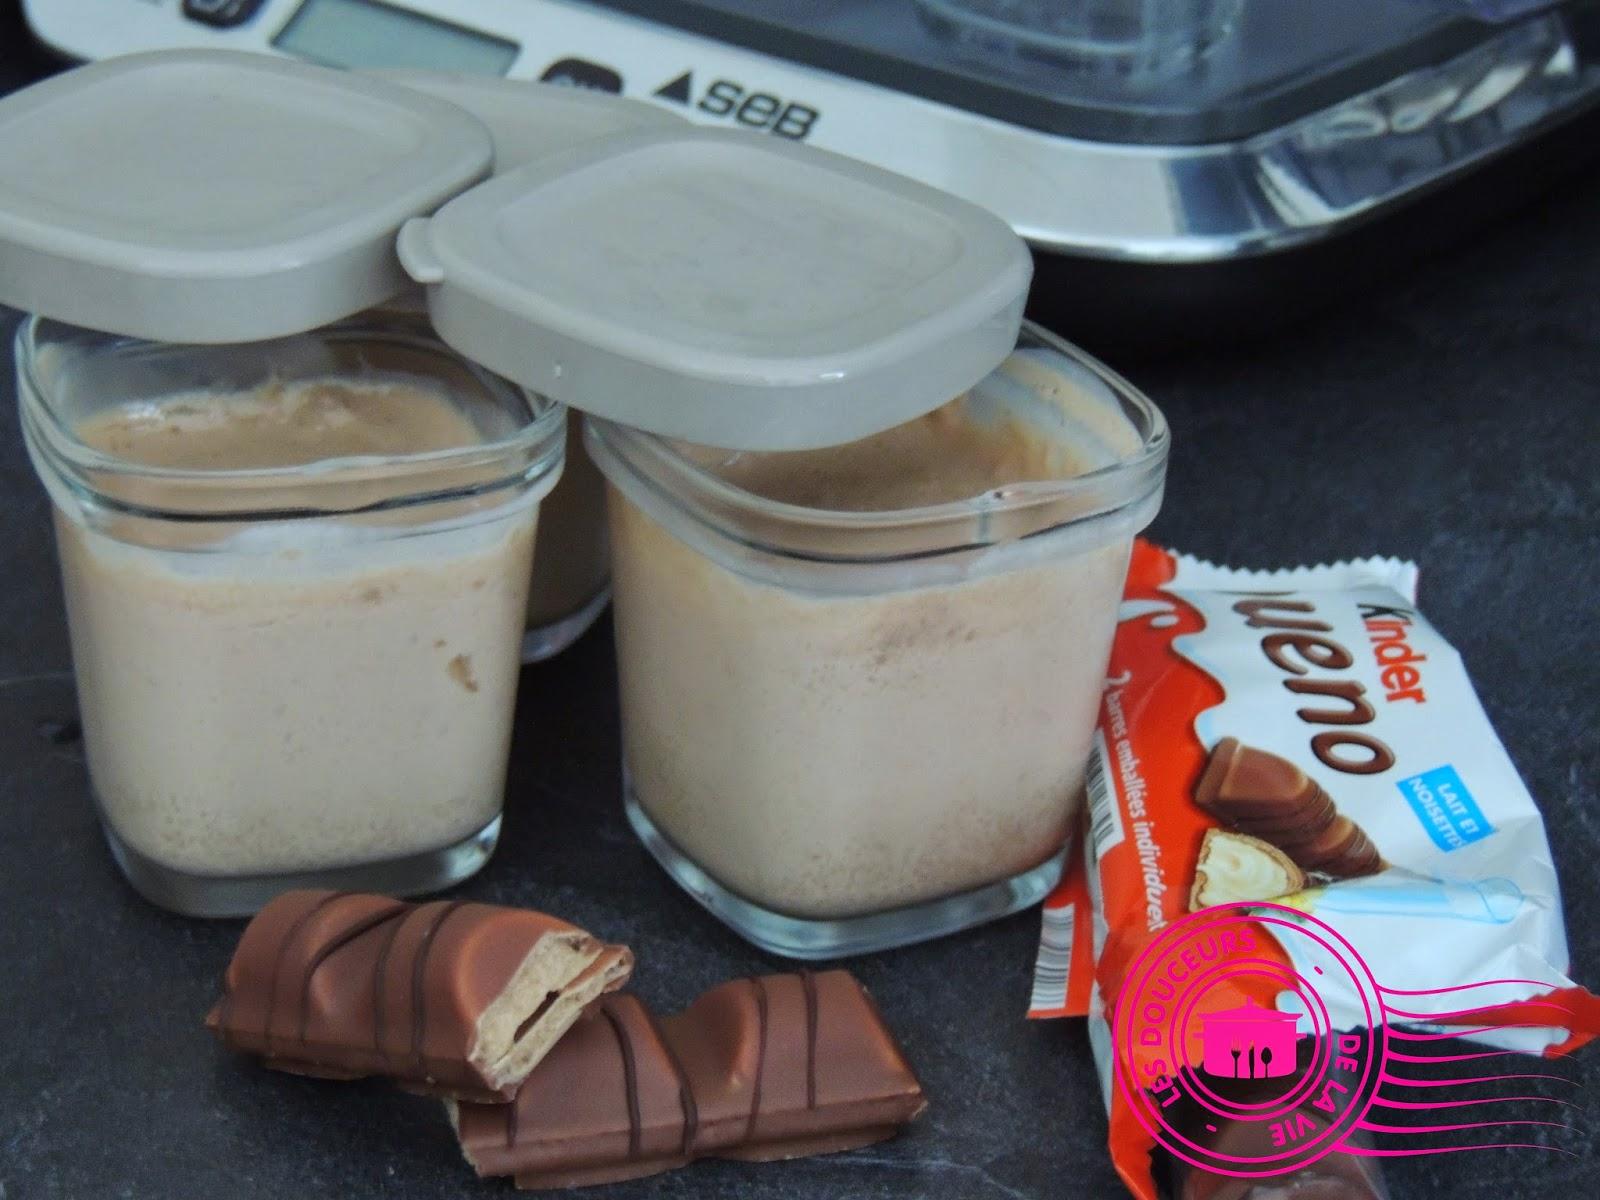 cr 232 me dessert danette au kinder bueno yaourti 232 re multi d 233 lices petit bec gourmand